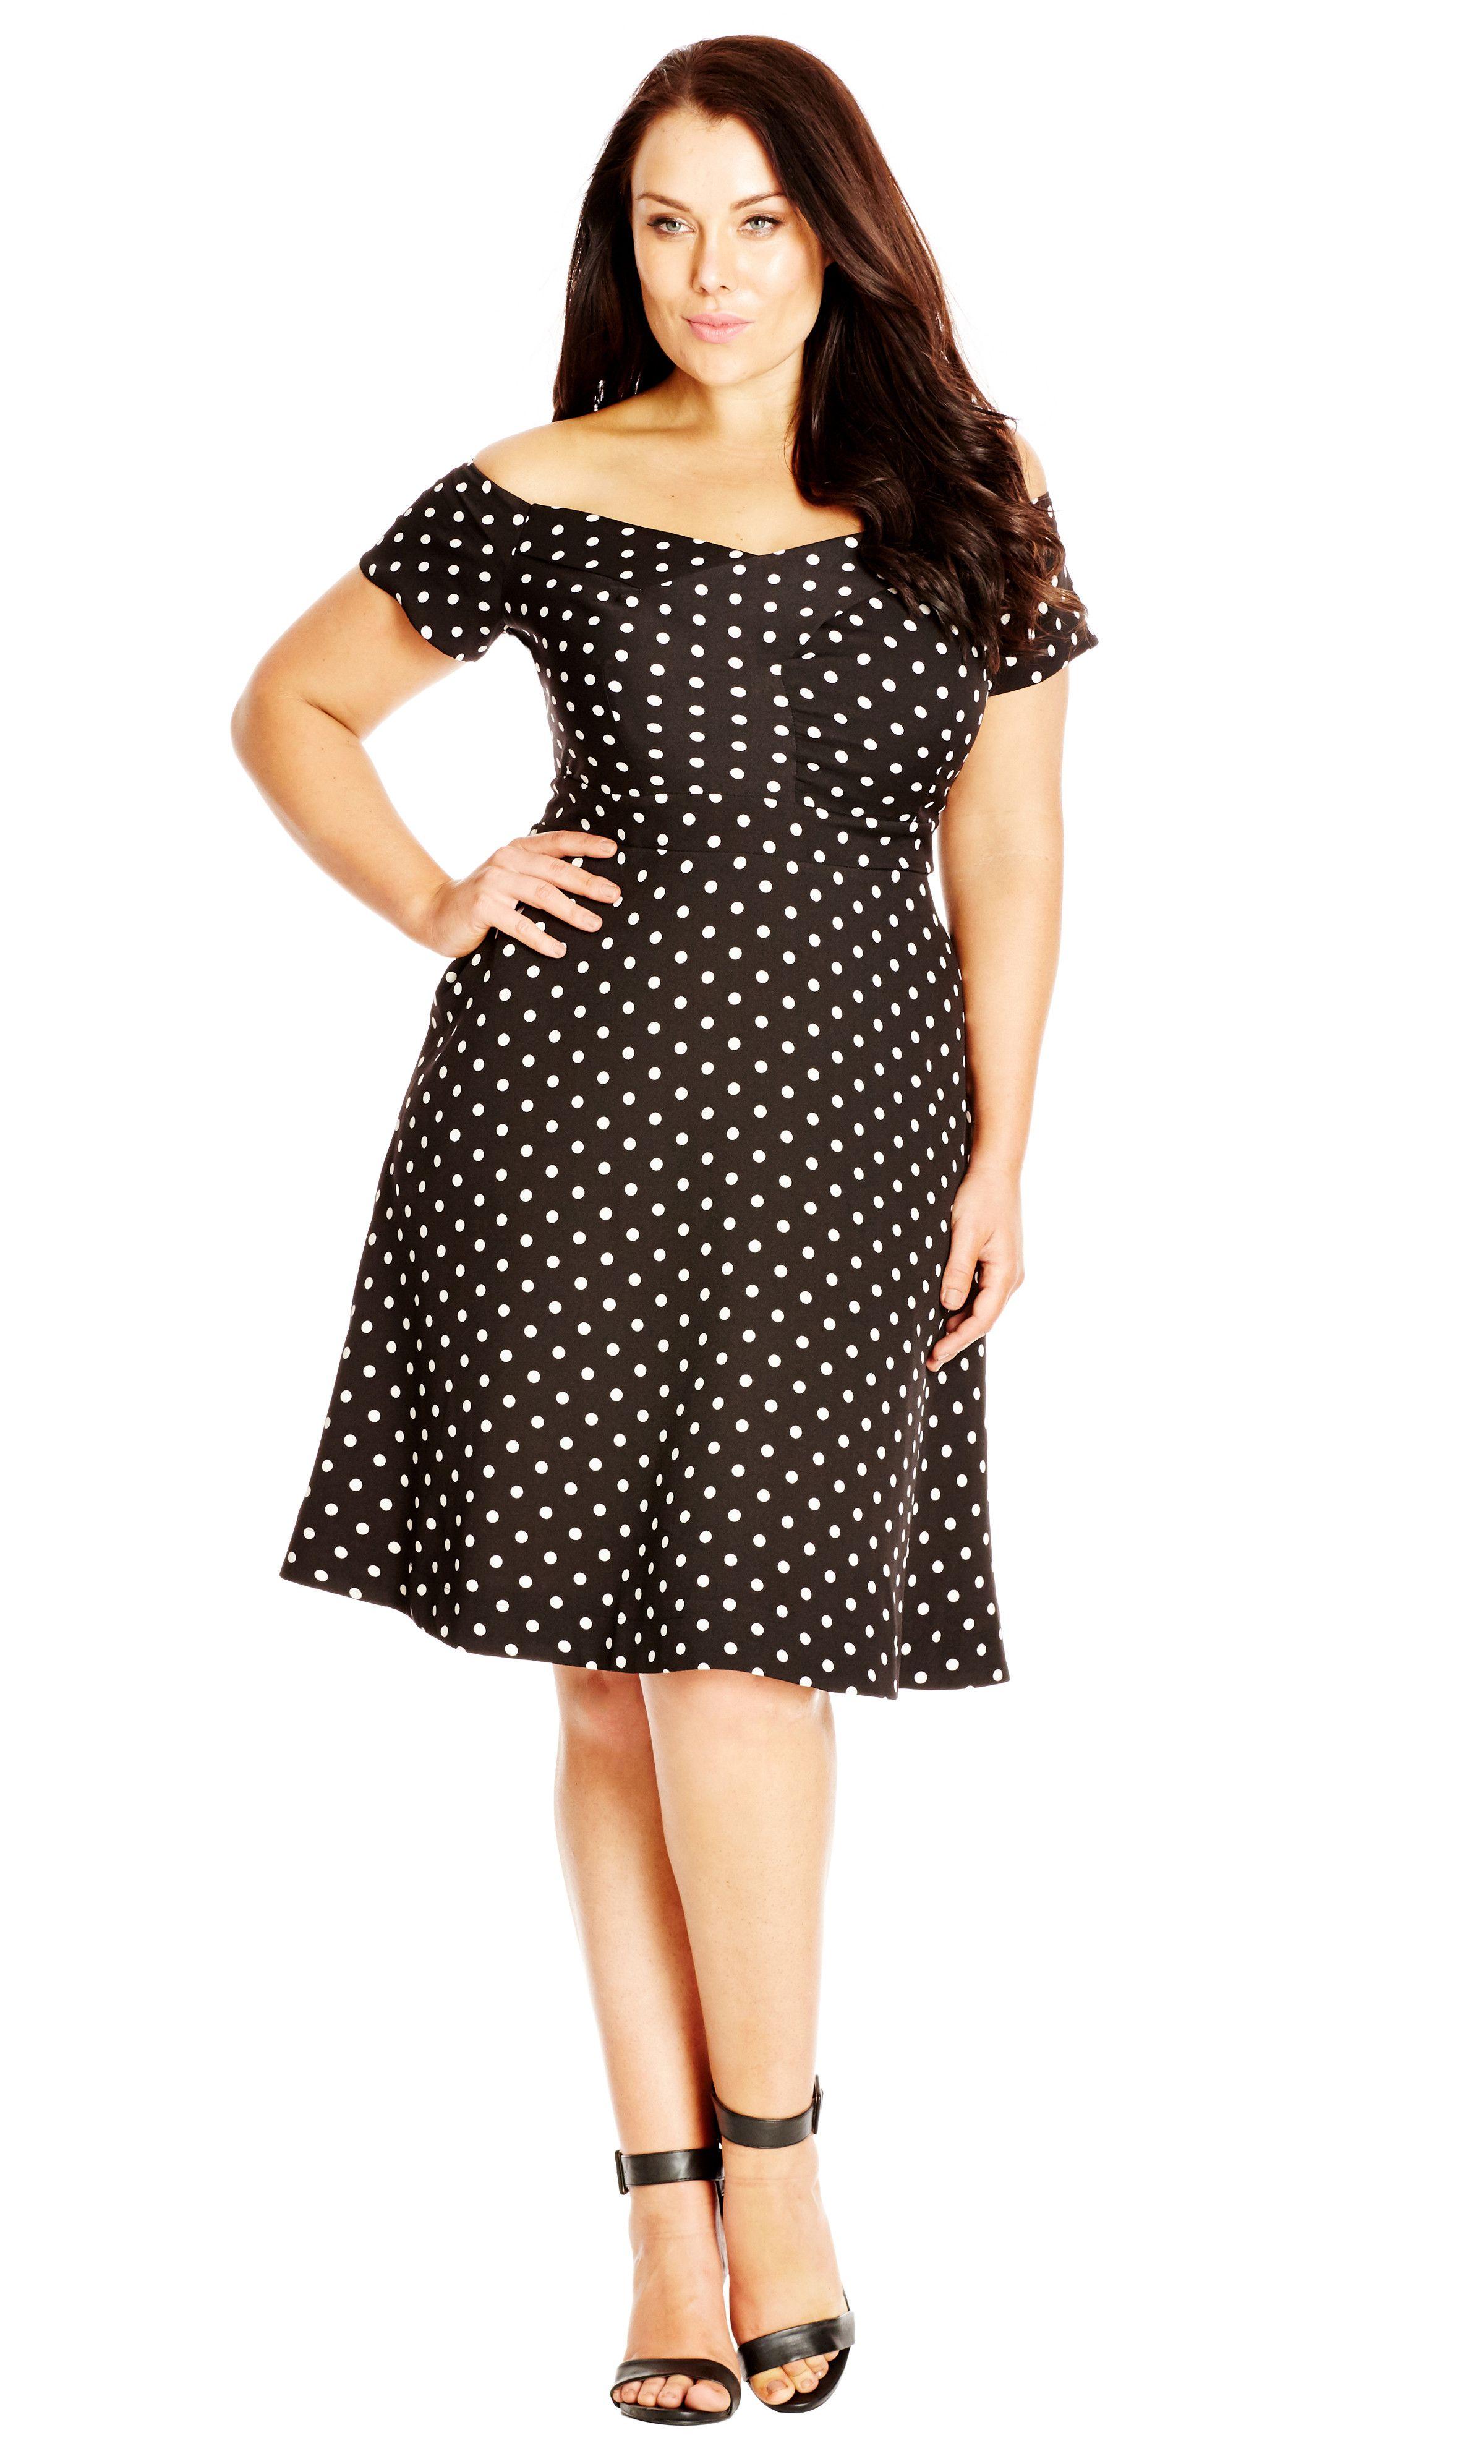 Shop Women s Plus Size Women s Plus Size Polka Dot f Shoulder Fit